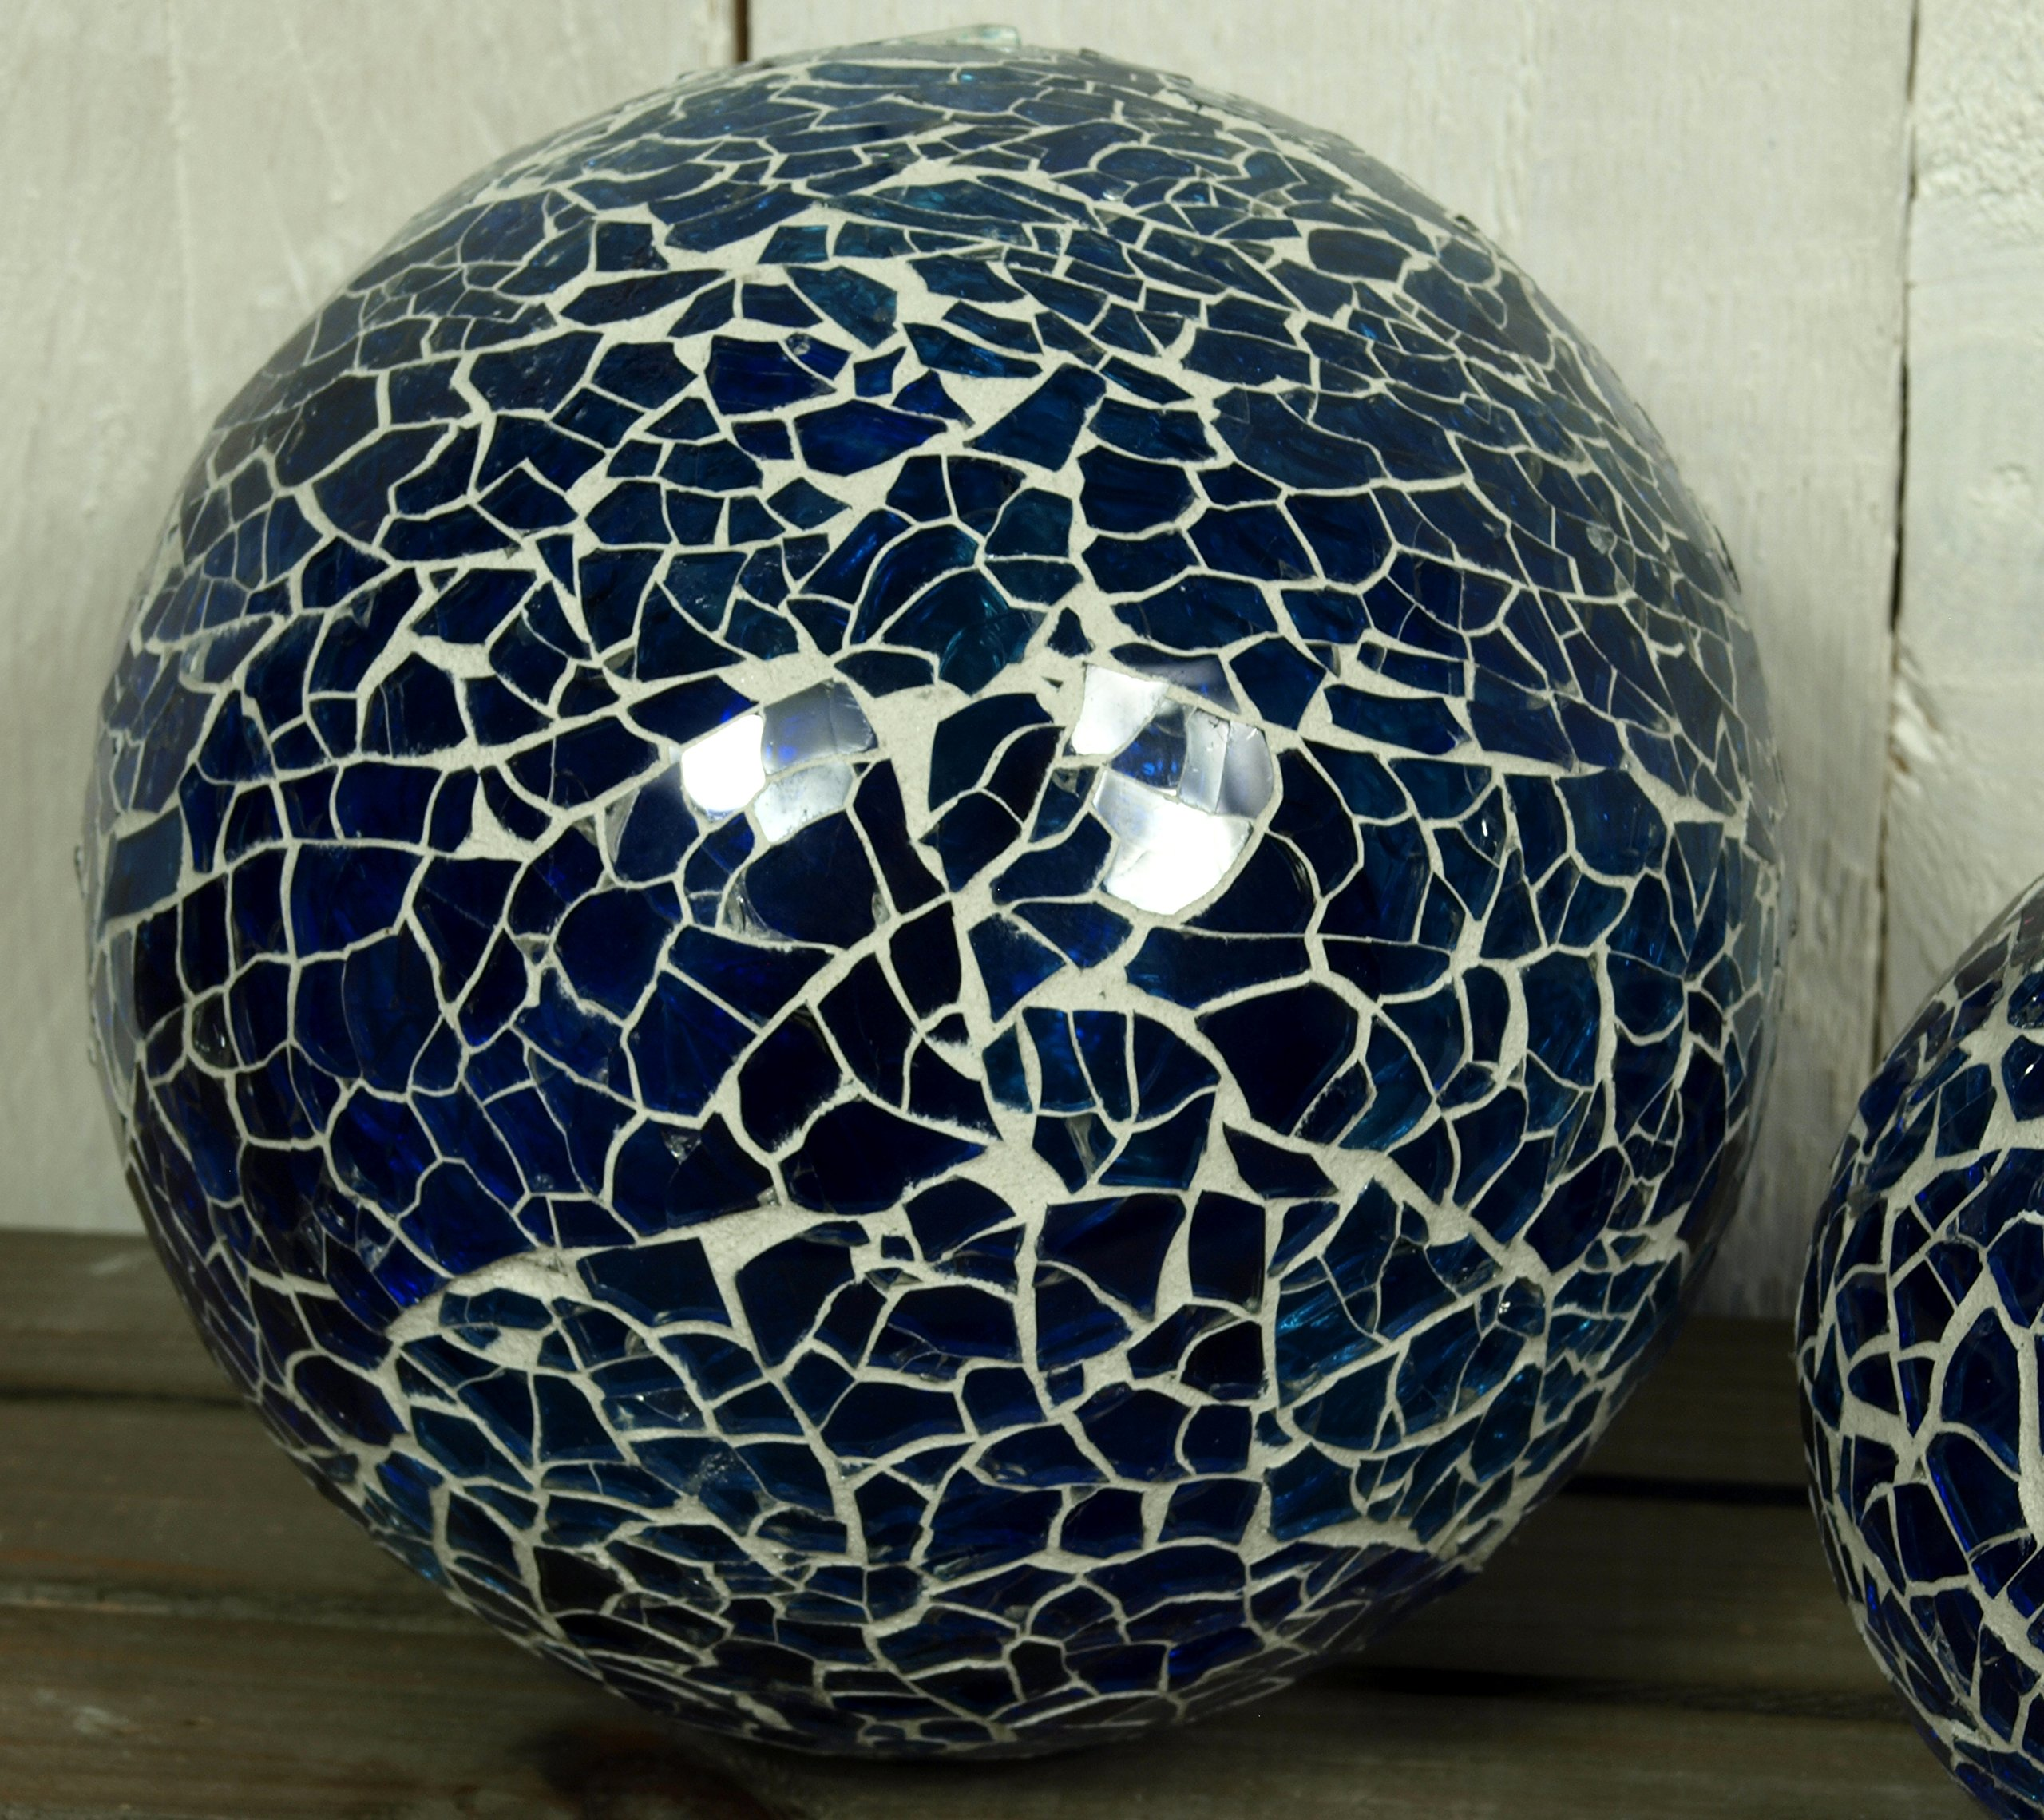 Unbekannt-2er-Set-Dekokugeln-Mosaik-Kugel-Kugel-blau-maritim-aus-Glas–ca-85-125cm